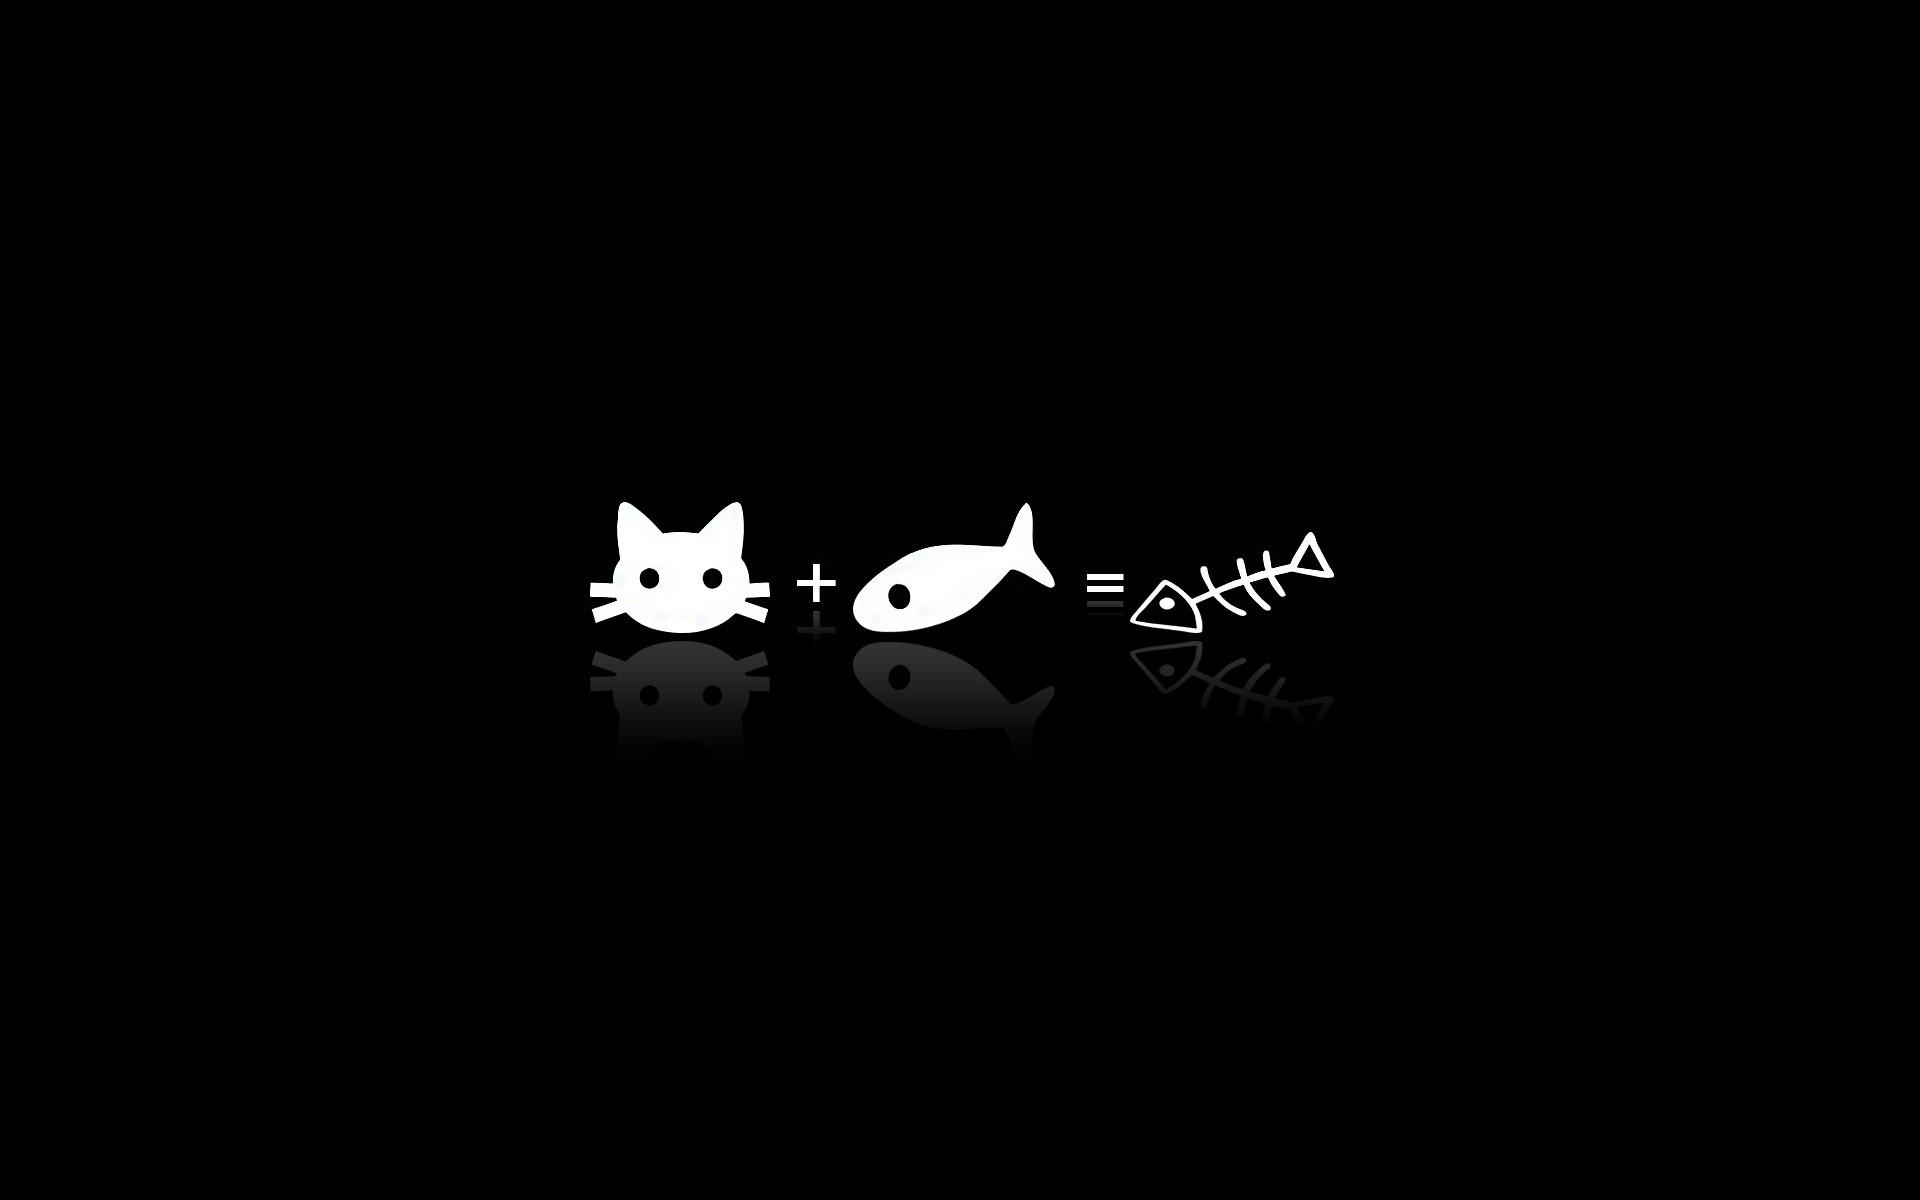 black cat minimalism text logo brand darkness bat computer wallpaper black  and white monochrome photography font